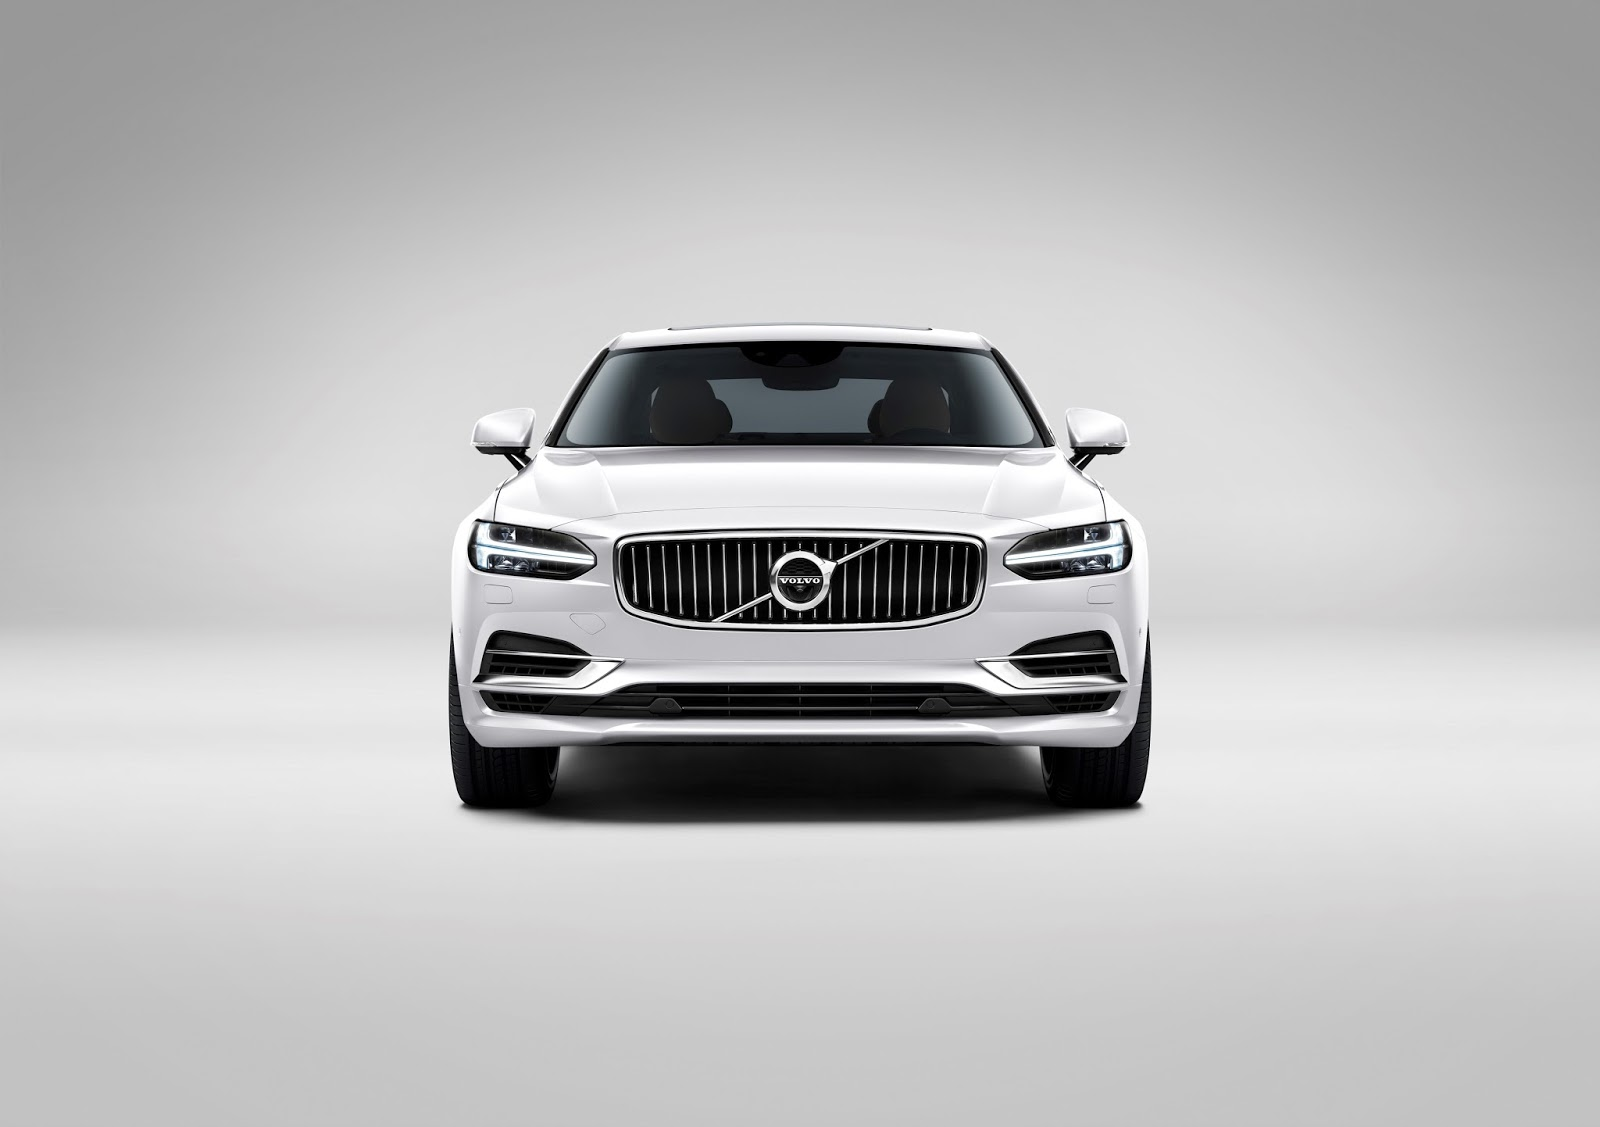 170131 Front Volvo S90 White Το νέο Volvo S90 έρχεται και βάζει φωτιά στον ανταγωνισμό premium sedan, Volvo, Volvo Cars, Volvo S90